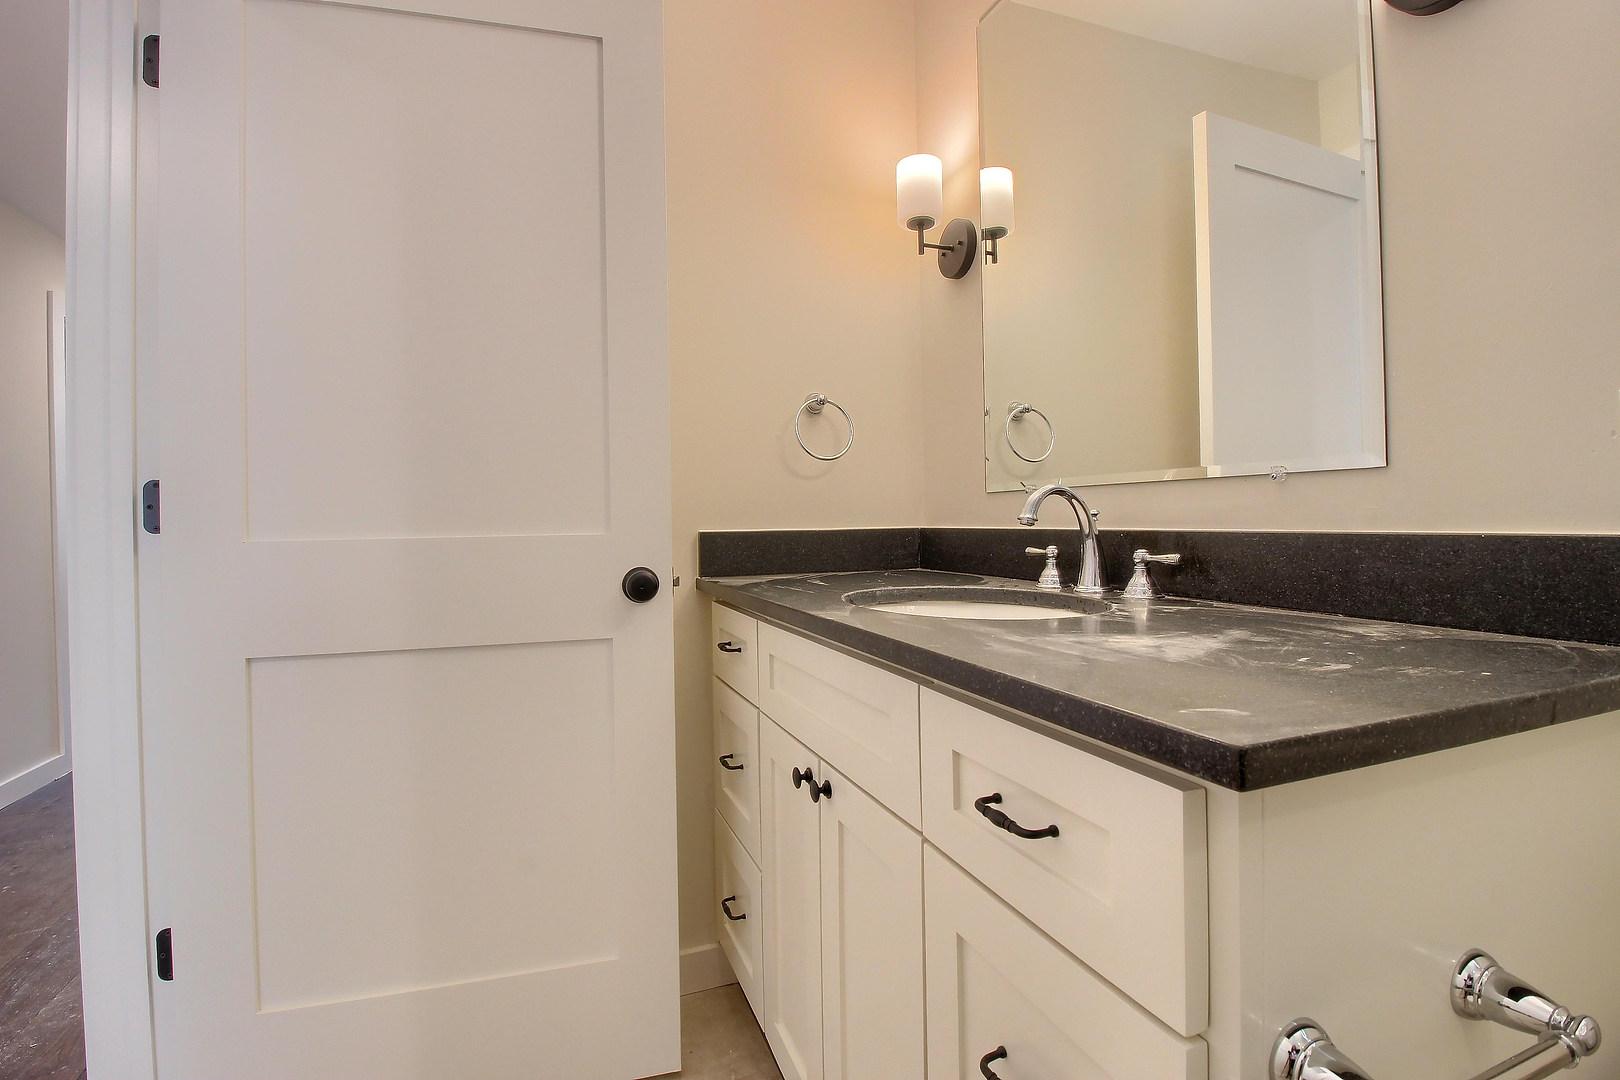 Home Renovation Bathroom Sink on Bouldin in Austin, TX